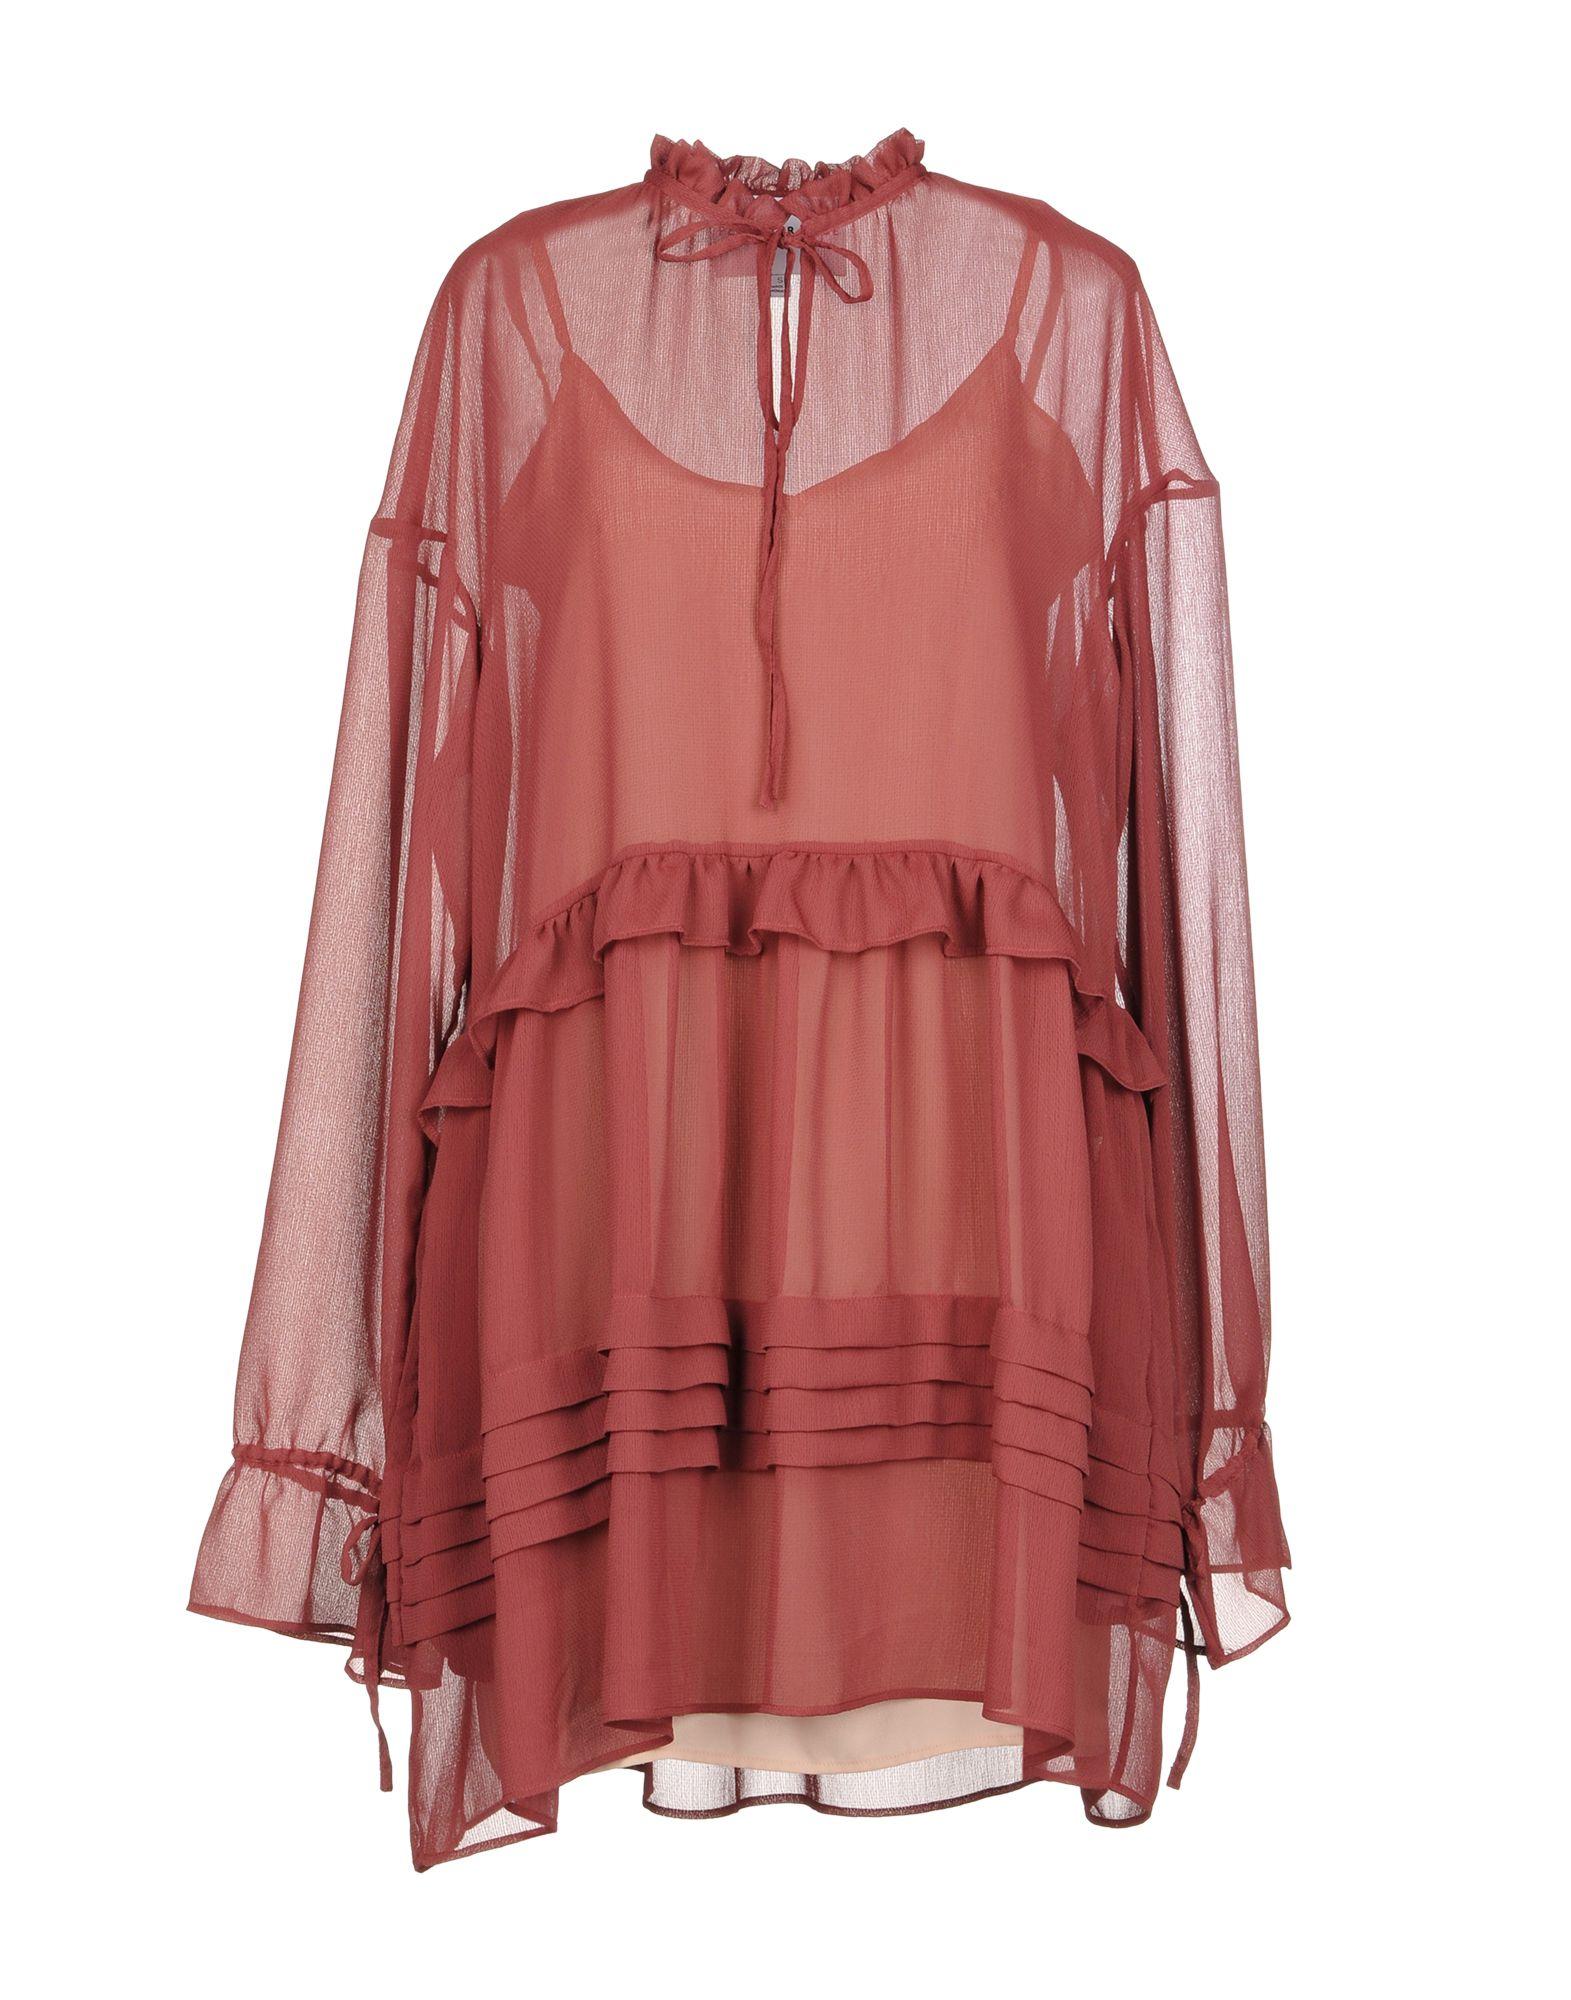 PERSEVERANCE Short Dress in Pastel Pink